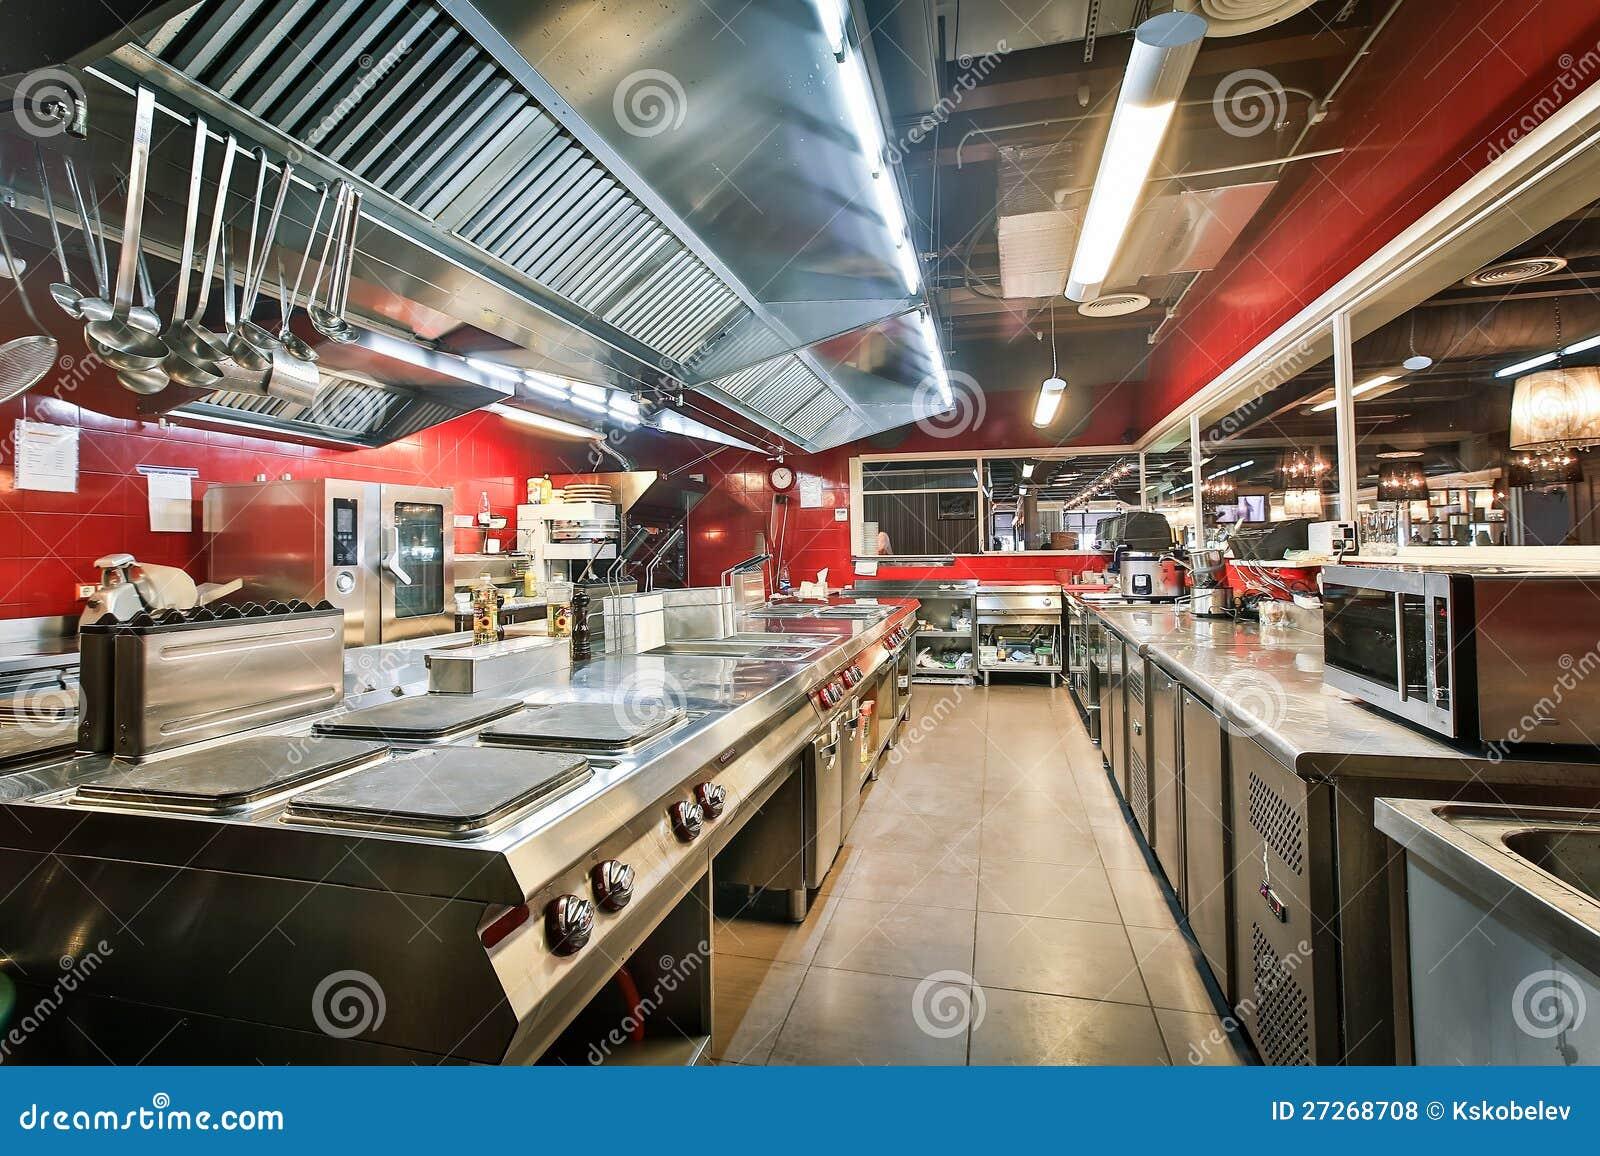 Restaurant Kitchen Images restaurant-kitchen-27268708 (1300×956) | keukens & koks